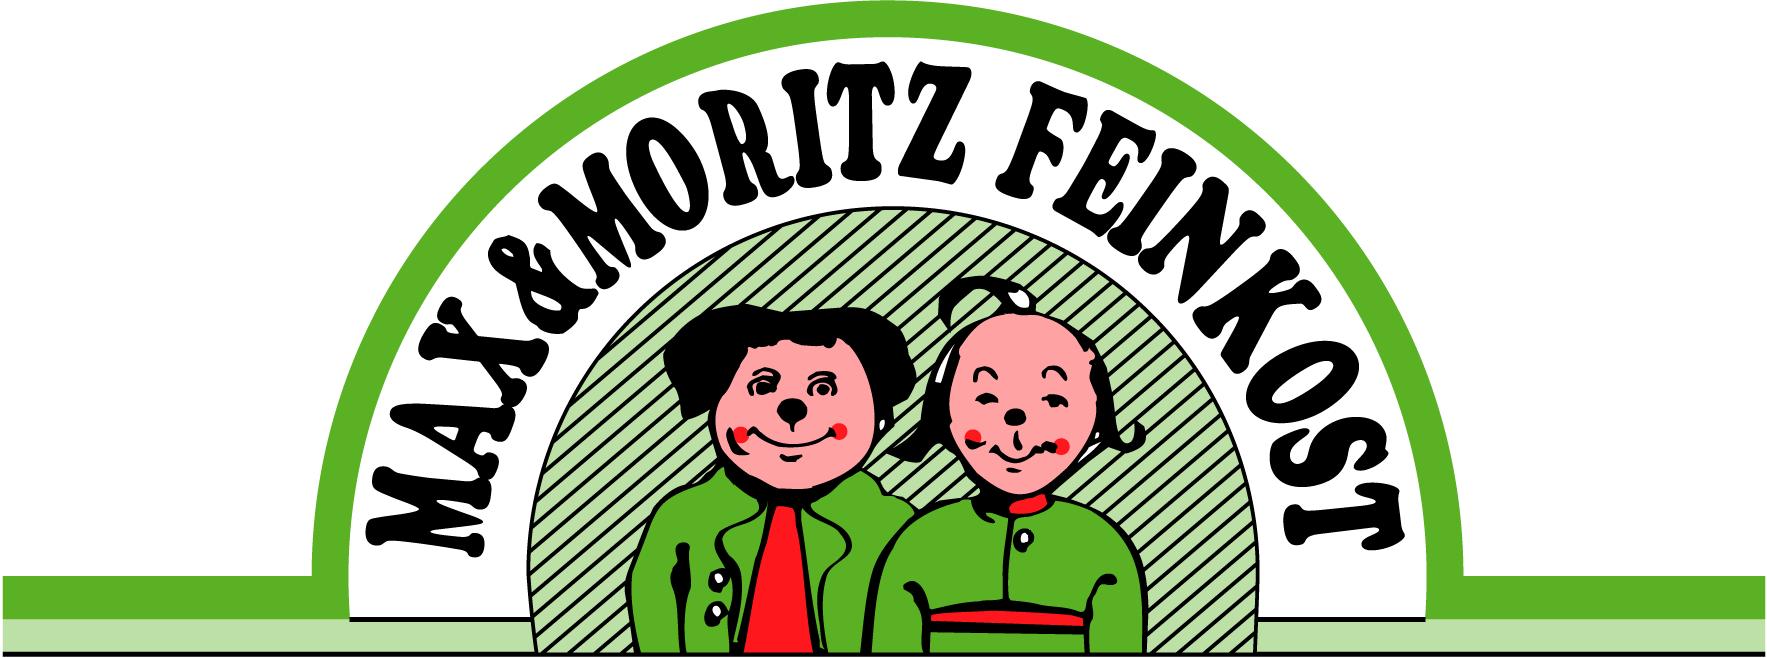 Max & Moritz Feinkost